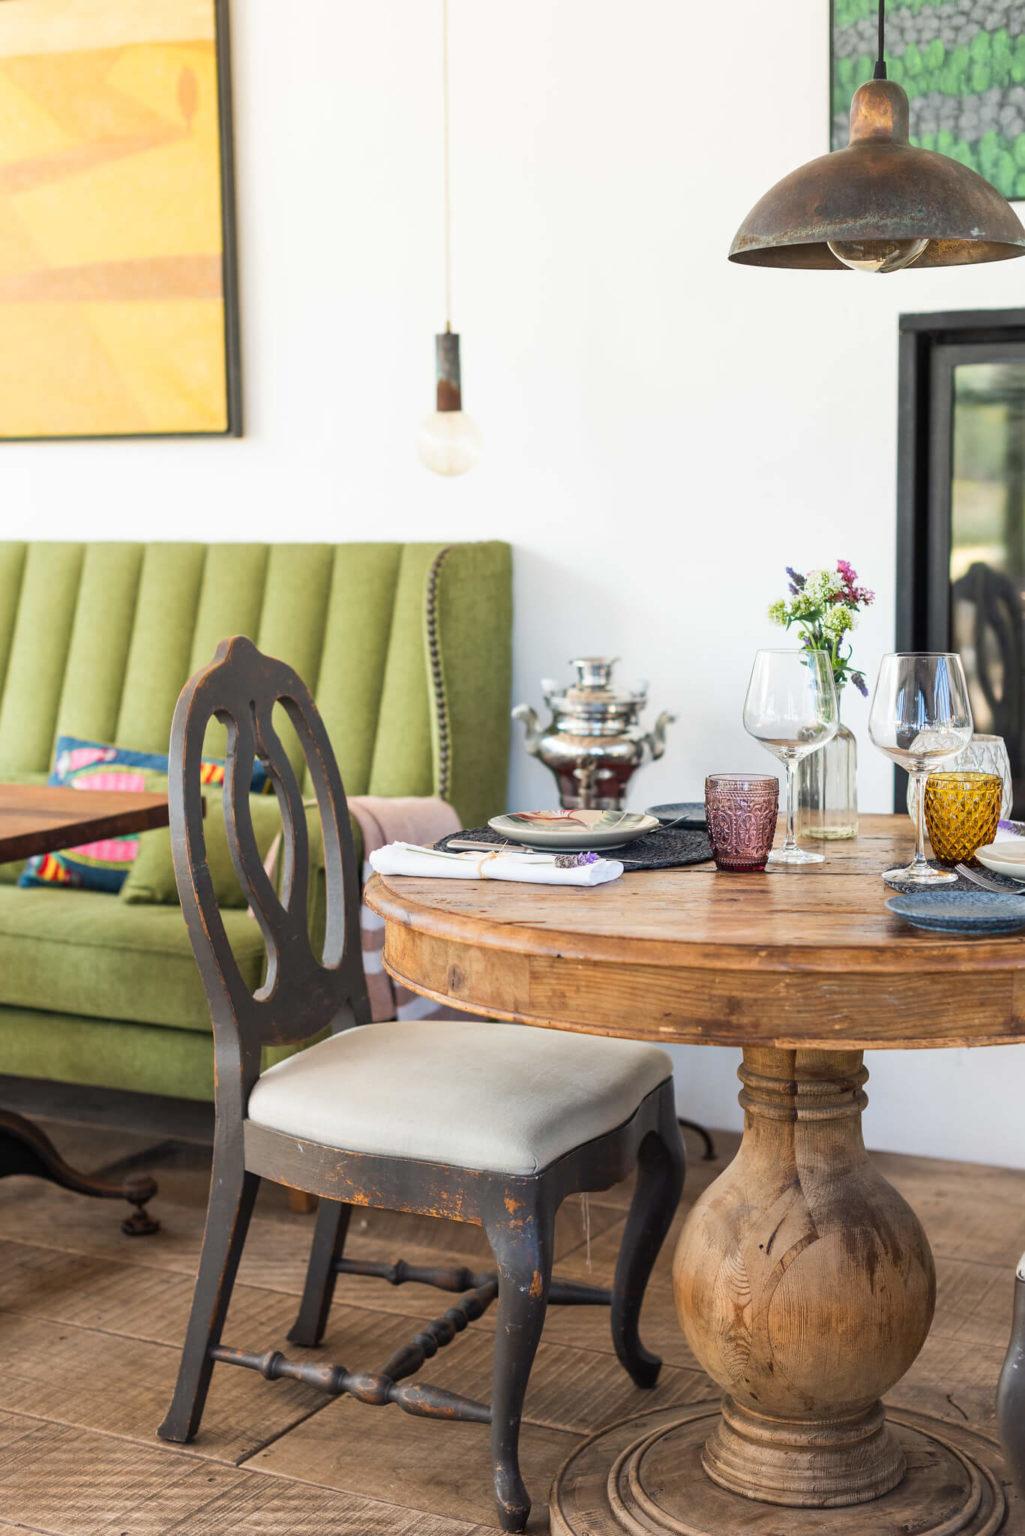 https://www.white-ibiza.com/wp-content/uploads/2020/03/white-ibiza-restaurants-es-cucons-01-1025x1536.jpg